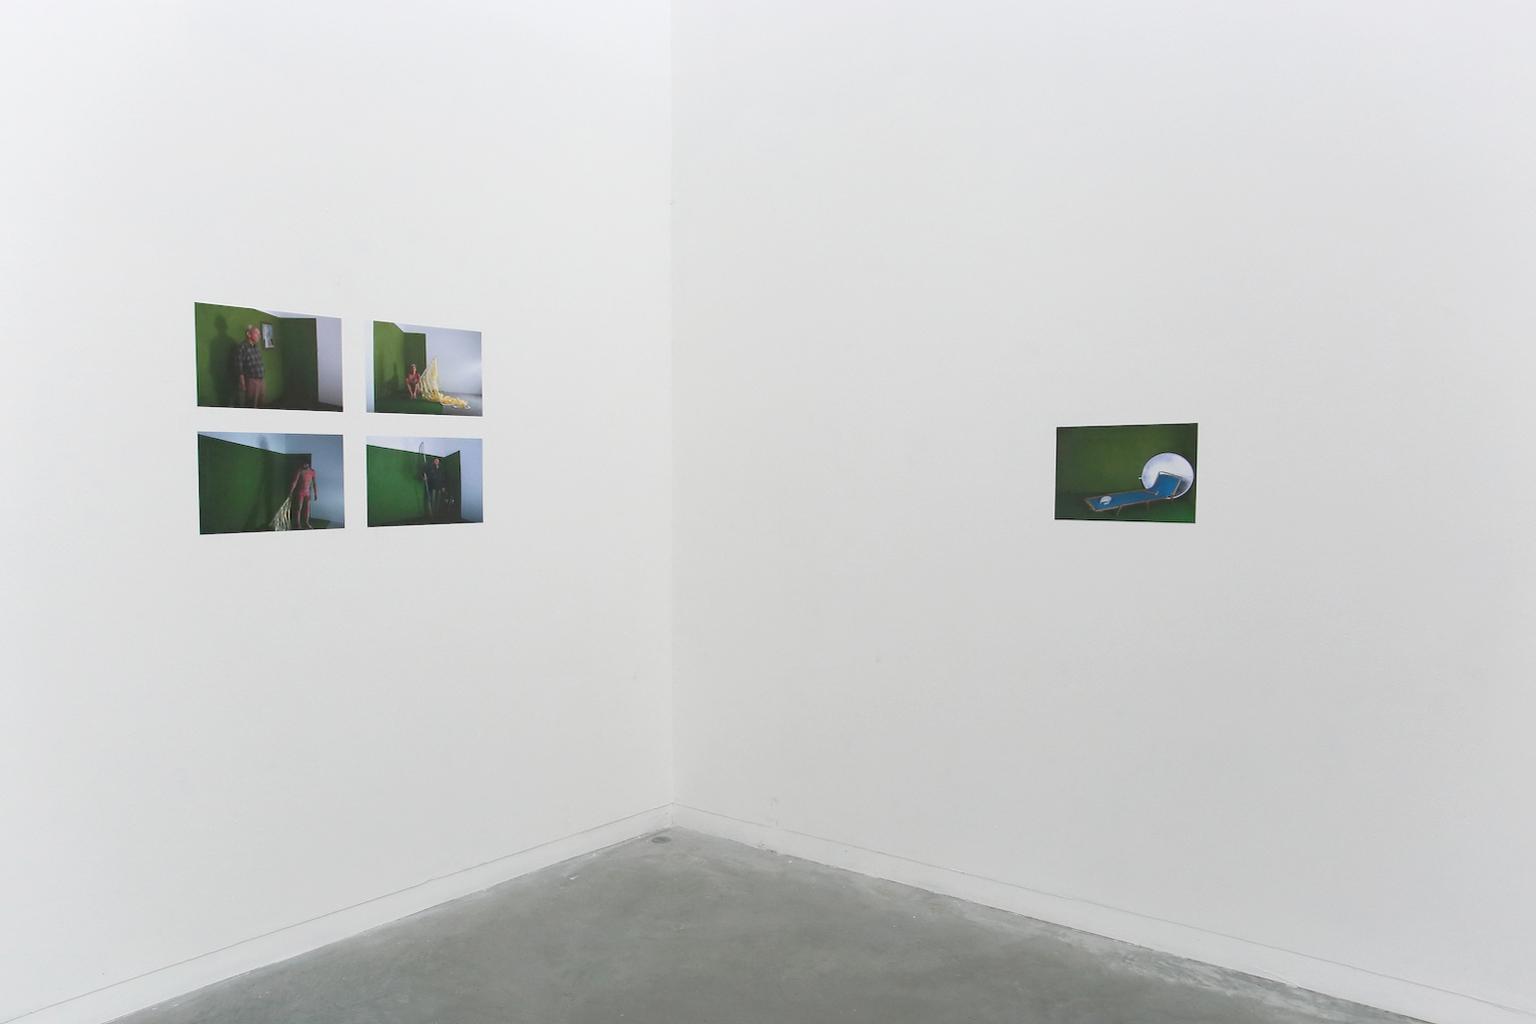 Photographies de Emma Charrin et Olivier Muller Exposition IMMERSION au CACL - mai 2015